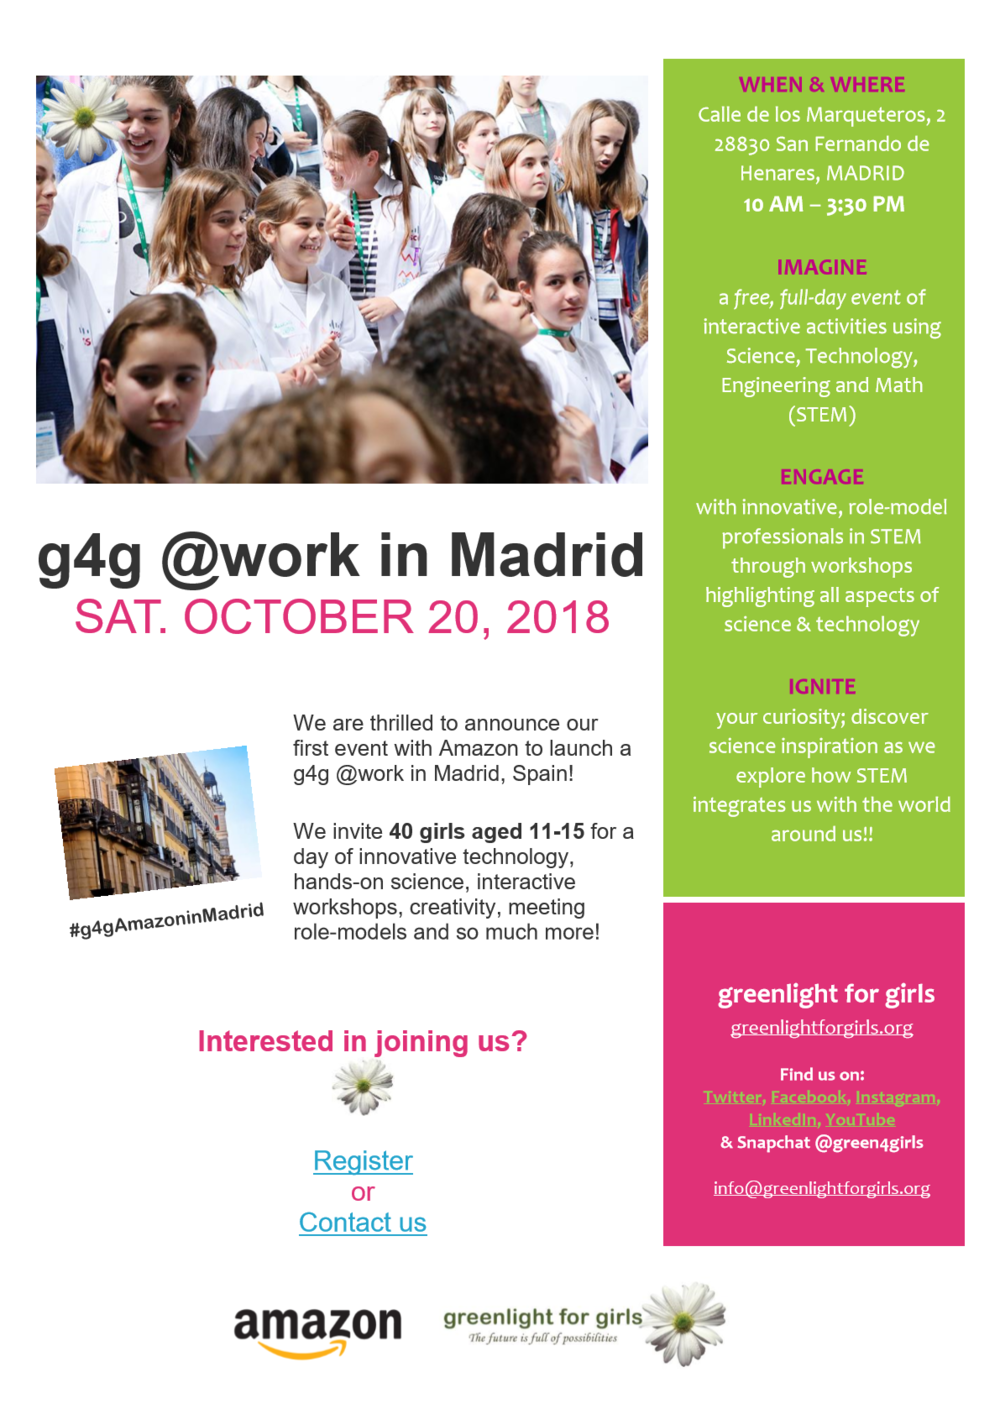 g4gatwork_Madrid2018_english.jpg